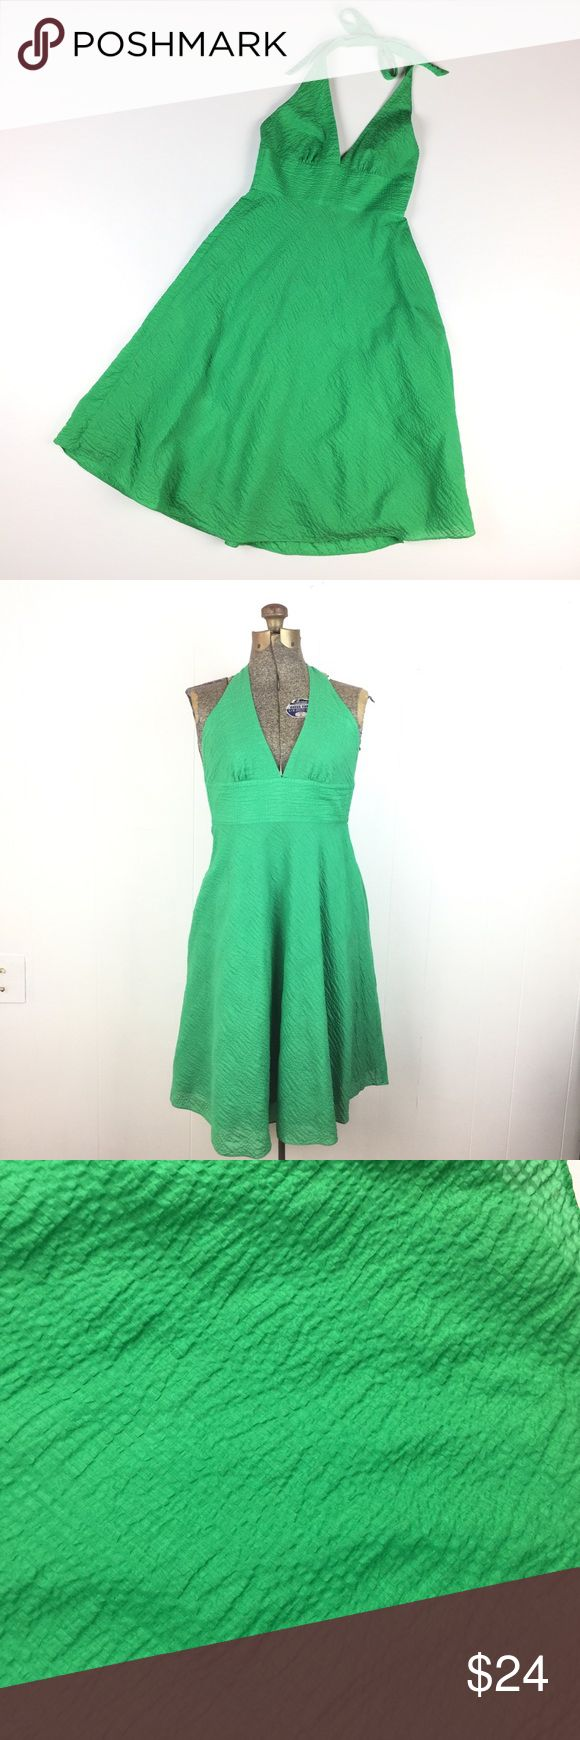 "J. Crew Grass Green Cotton Halter Dress // P2 J. Crew Grass green Crinkle cotton fit n flare Halter dress. Lined. Back zipper. Very good condition. 100% cotton. Size Petite 2. Apx: 40"" long tied at shortest length. 12 3/4"" waist flat. J. Crew Dresses"